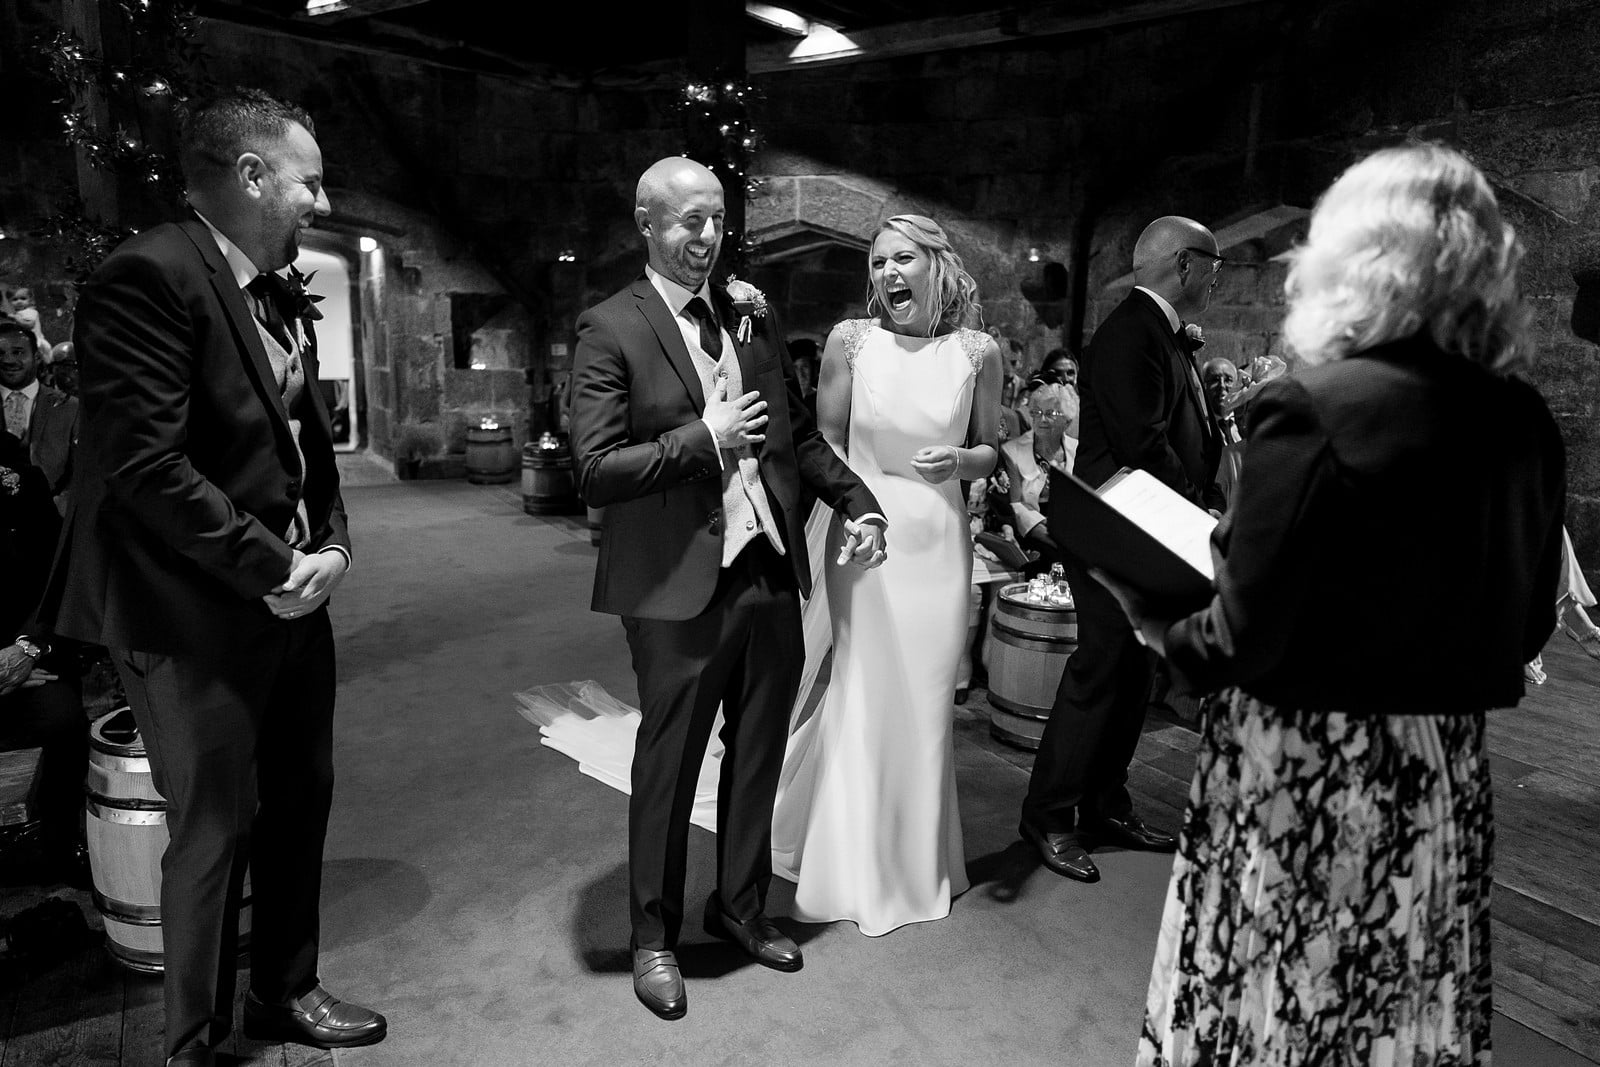 best of 2019 - Pendennis Castle wedding photographer 068